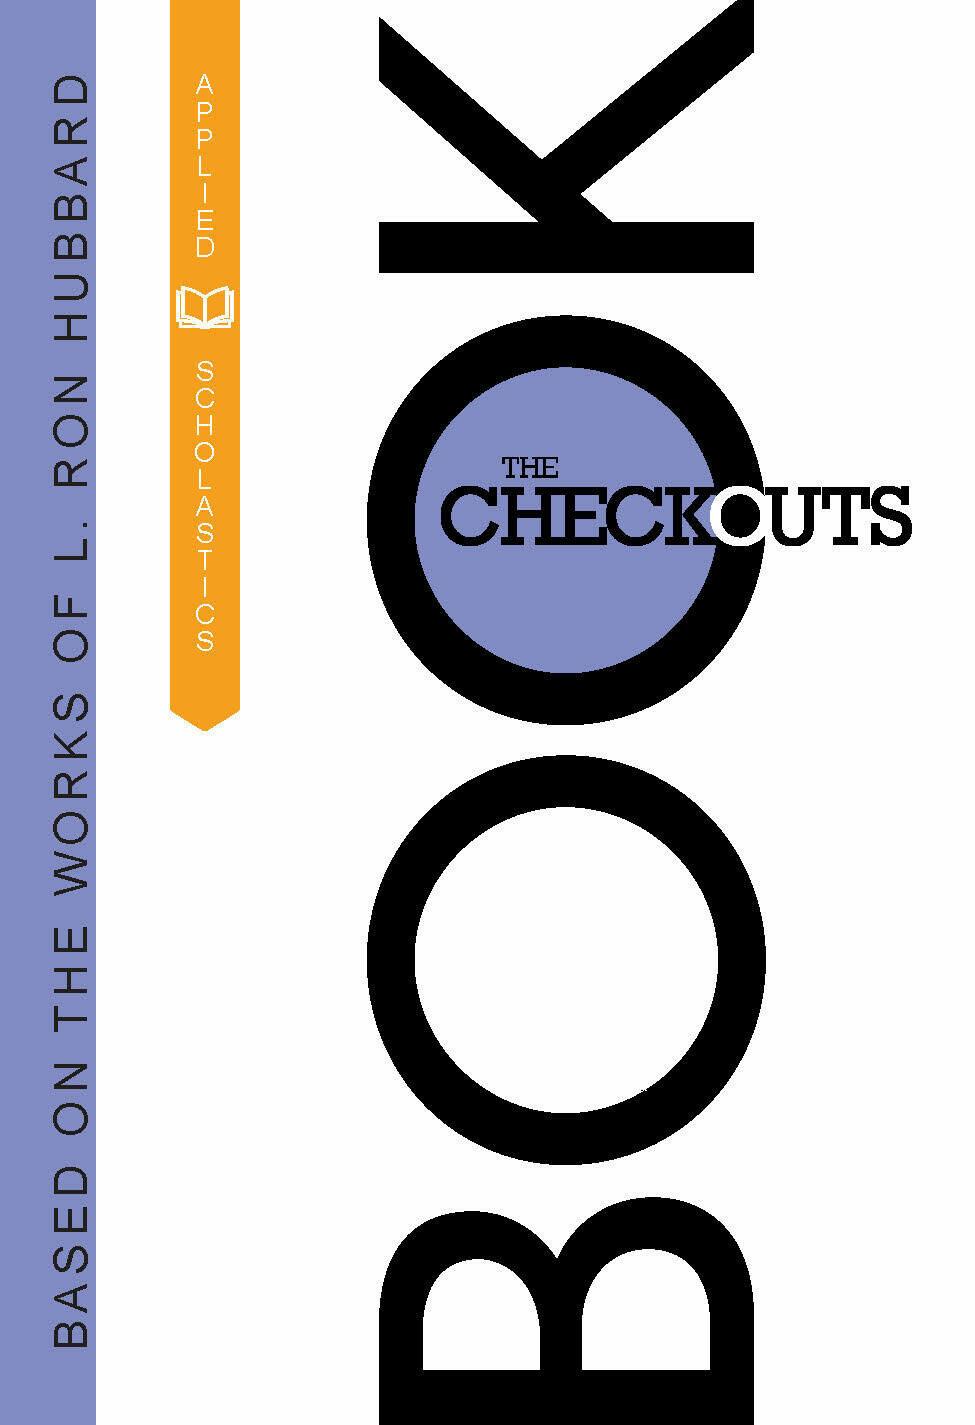 The Checkouts Book